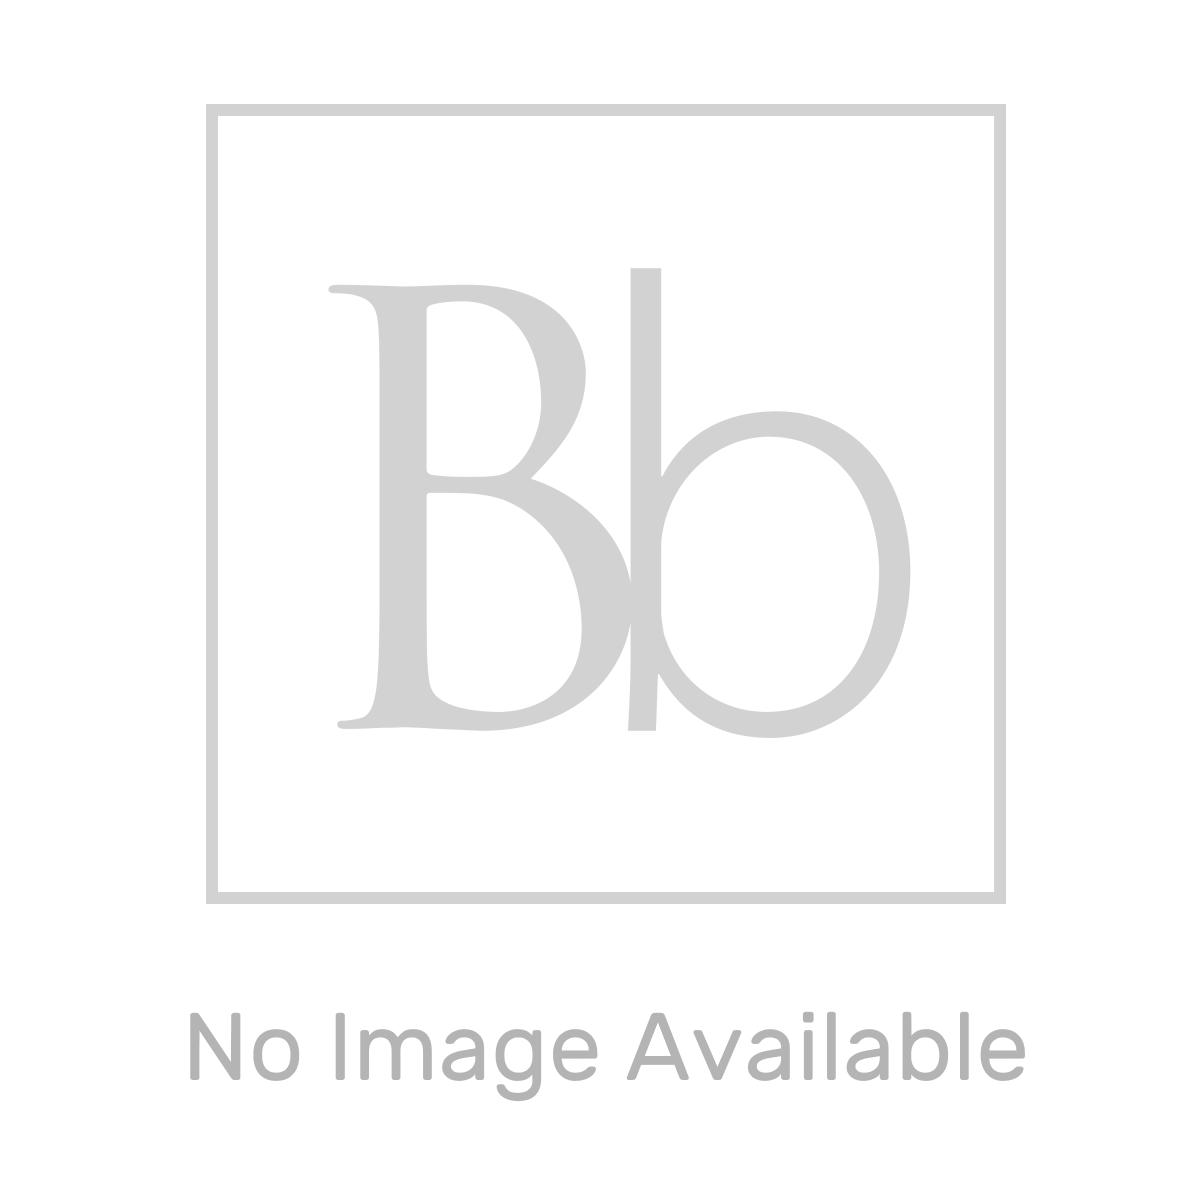 Merlyn Series 10 Showerwall Wetroom with Side Panel